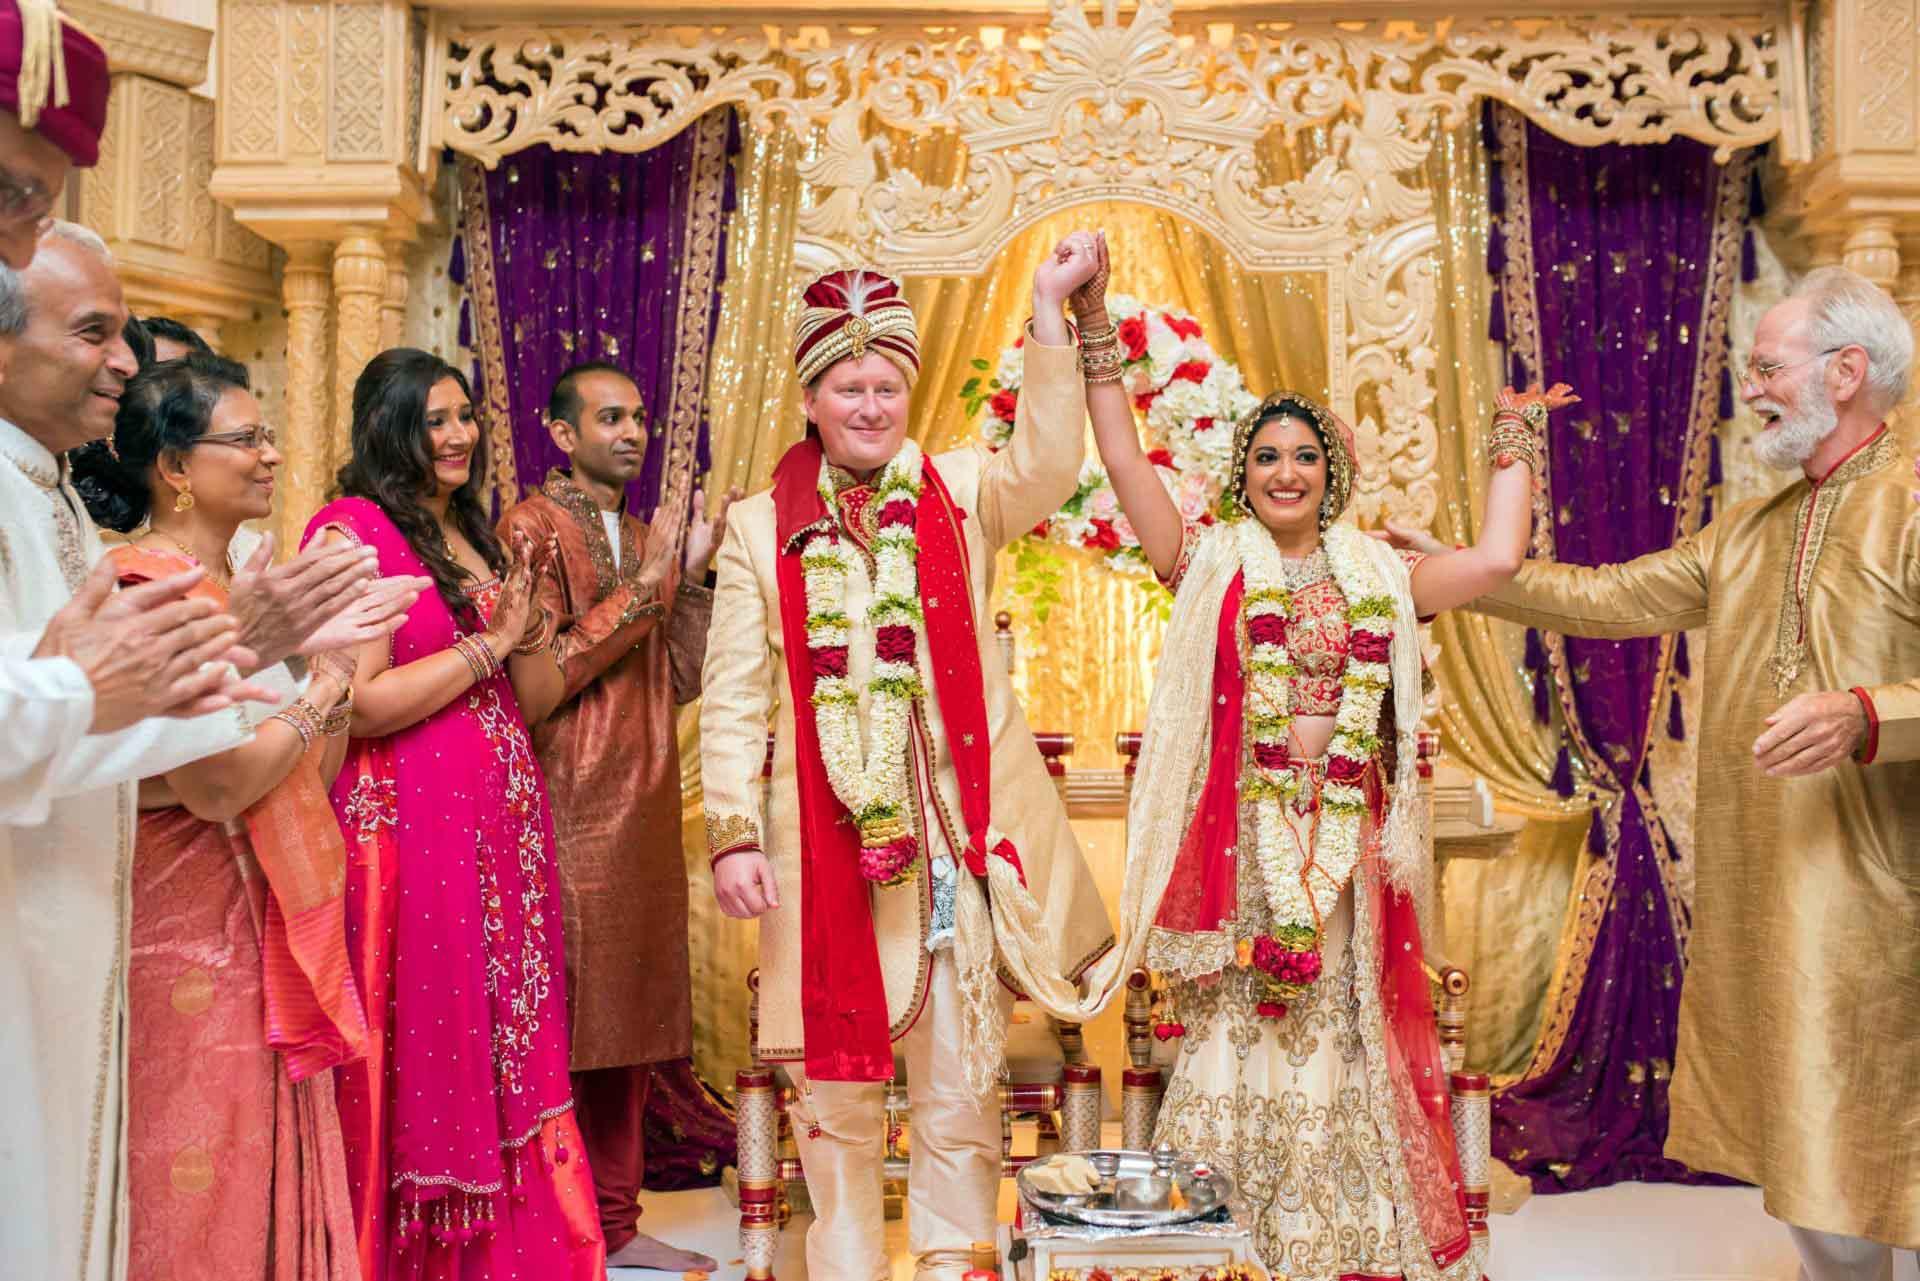 Indian Wedding Photography.Best Indian Wedding Photographer Boston Hire Indian Wedding